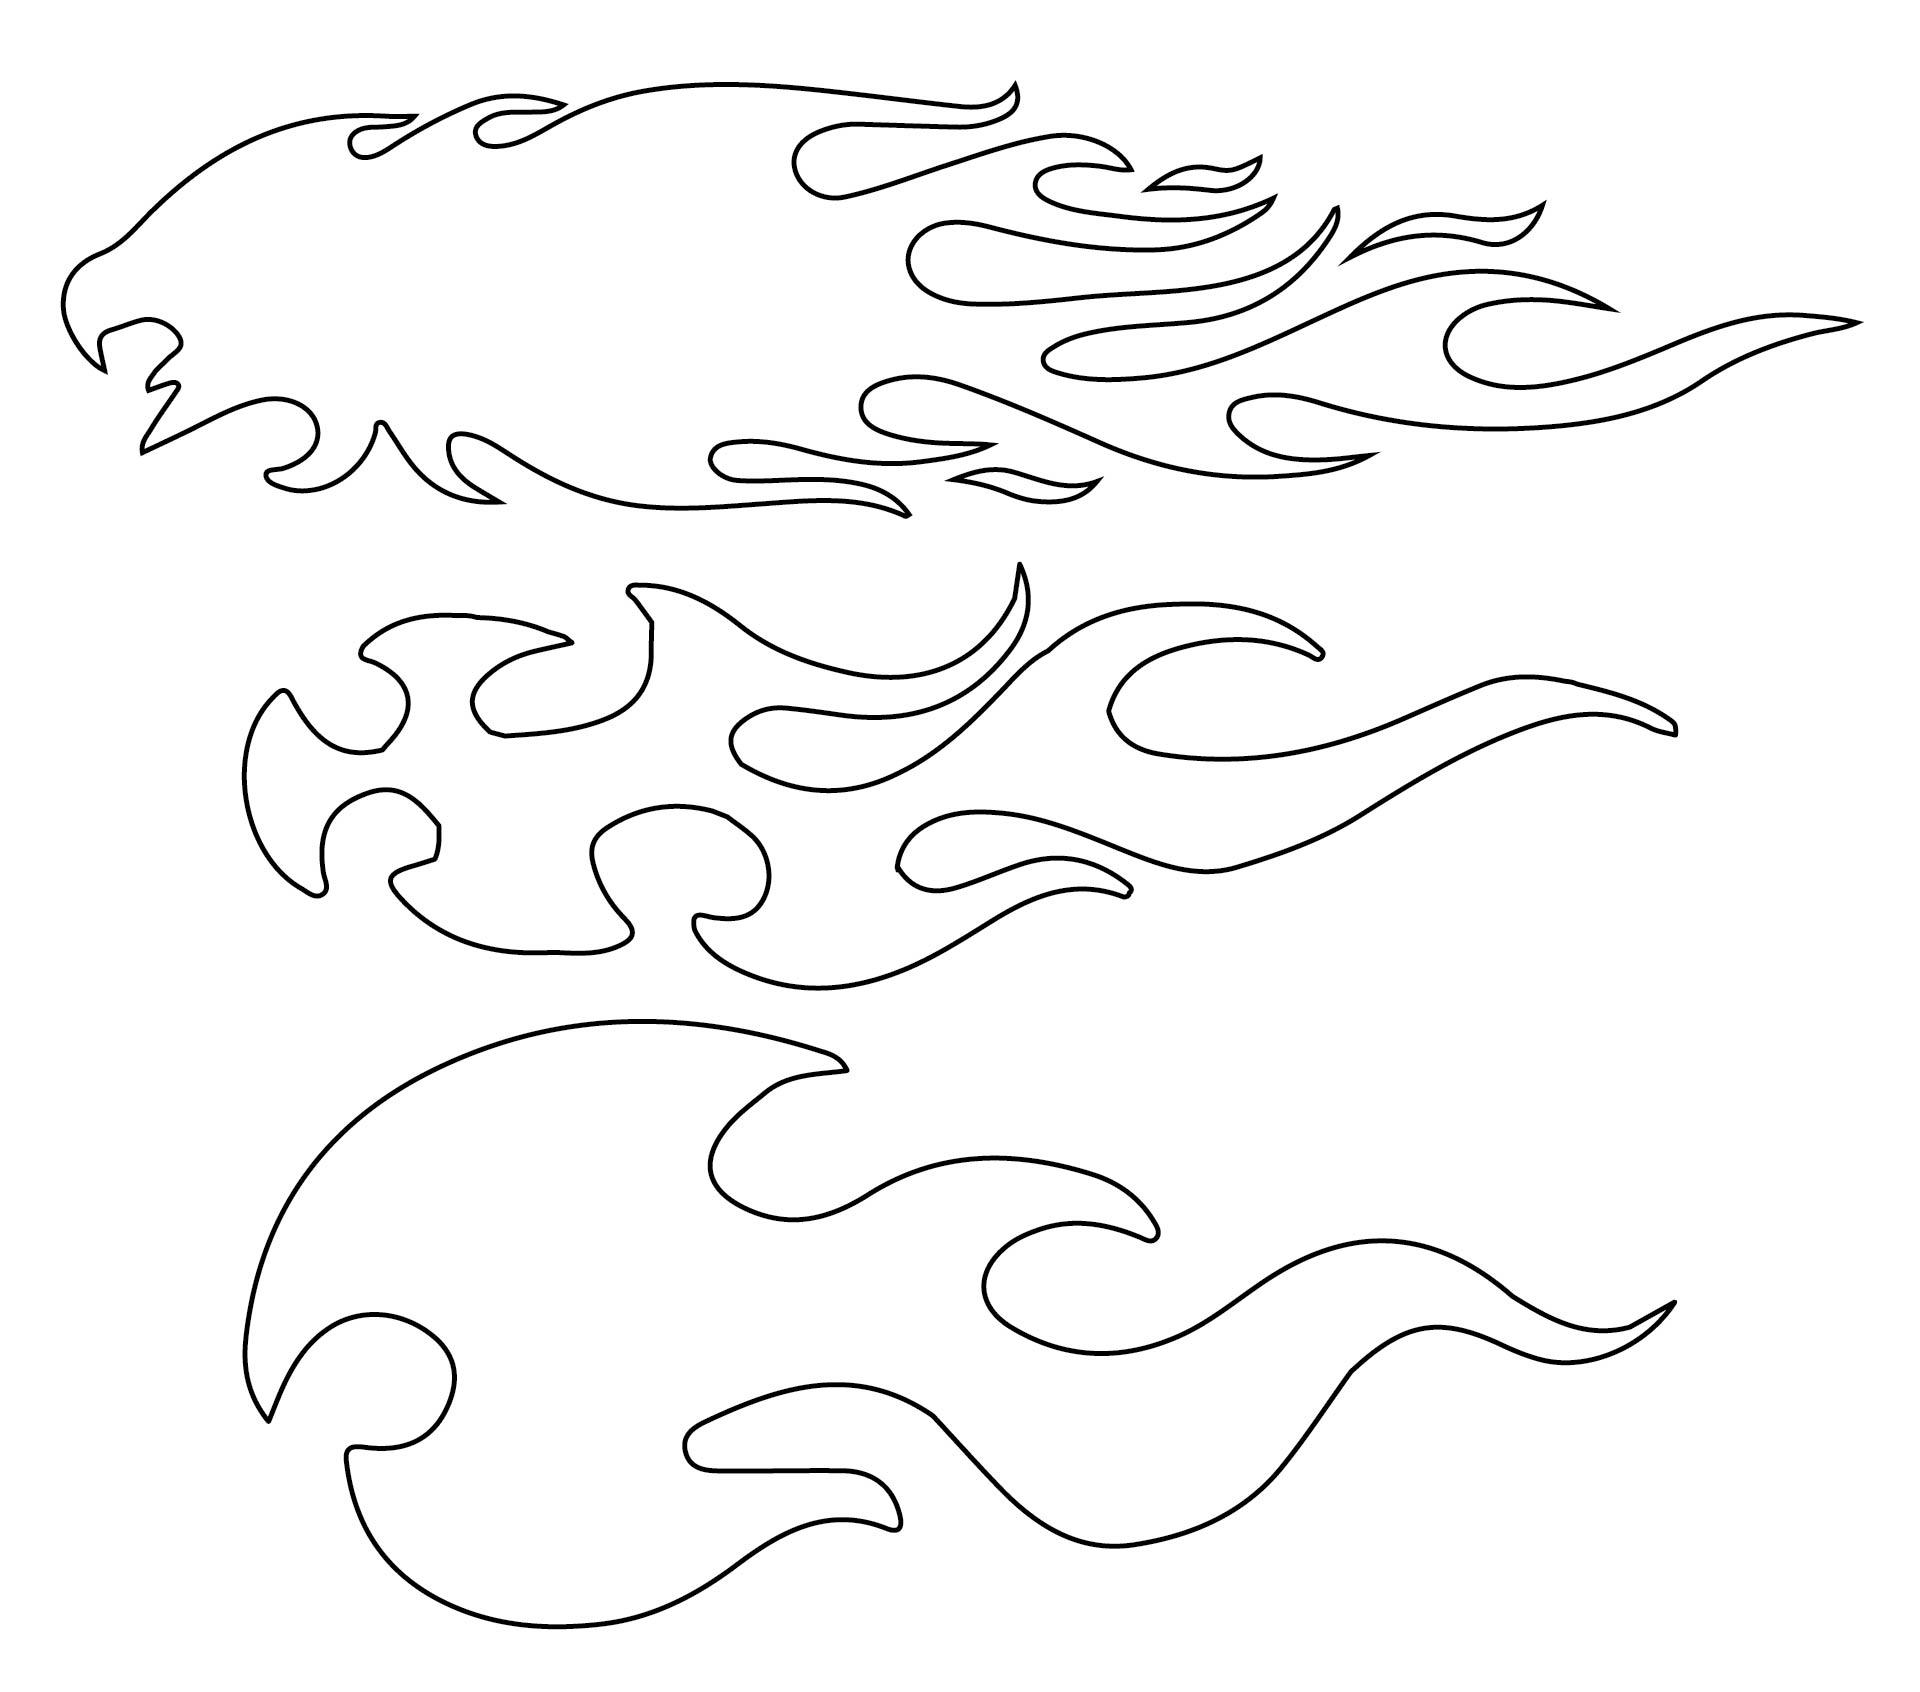 Printable Flame Airbrush Stencils Templates